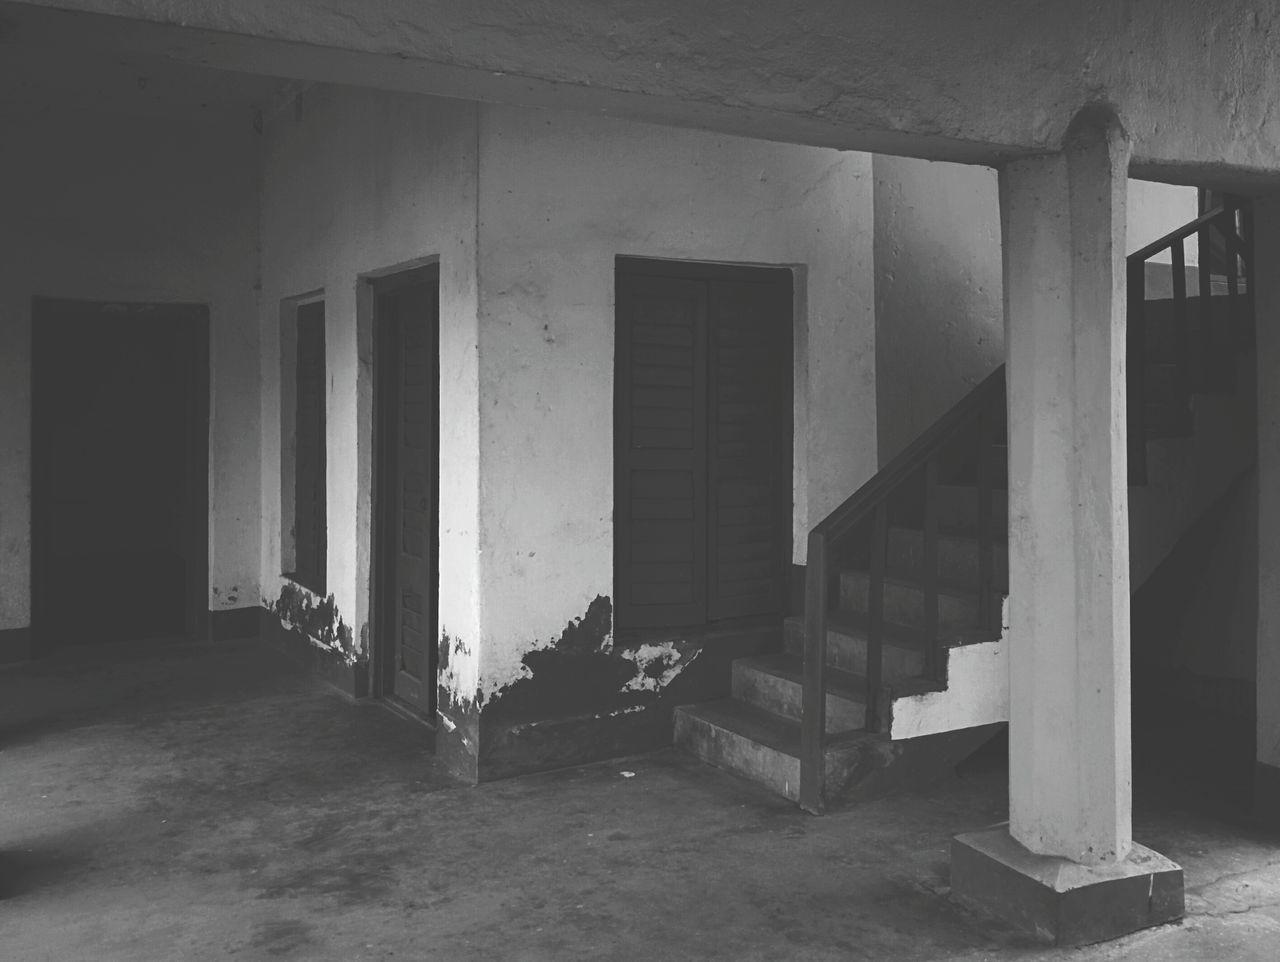 Architecture India Upanddown Stairs Arcitecture_bw Blackandwhite Photography Door DoorsAndWindowsProject Doors Blackandwhite Calcutta Black & White Loner Life